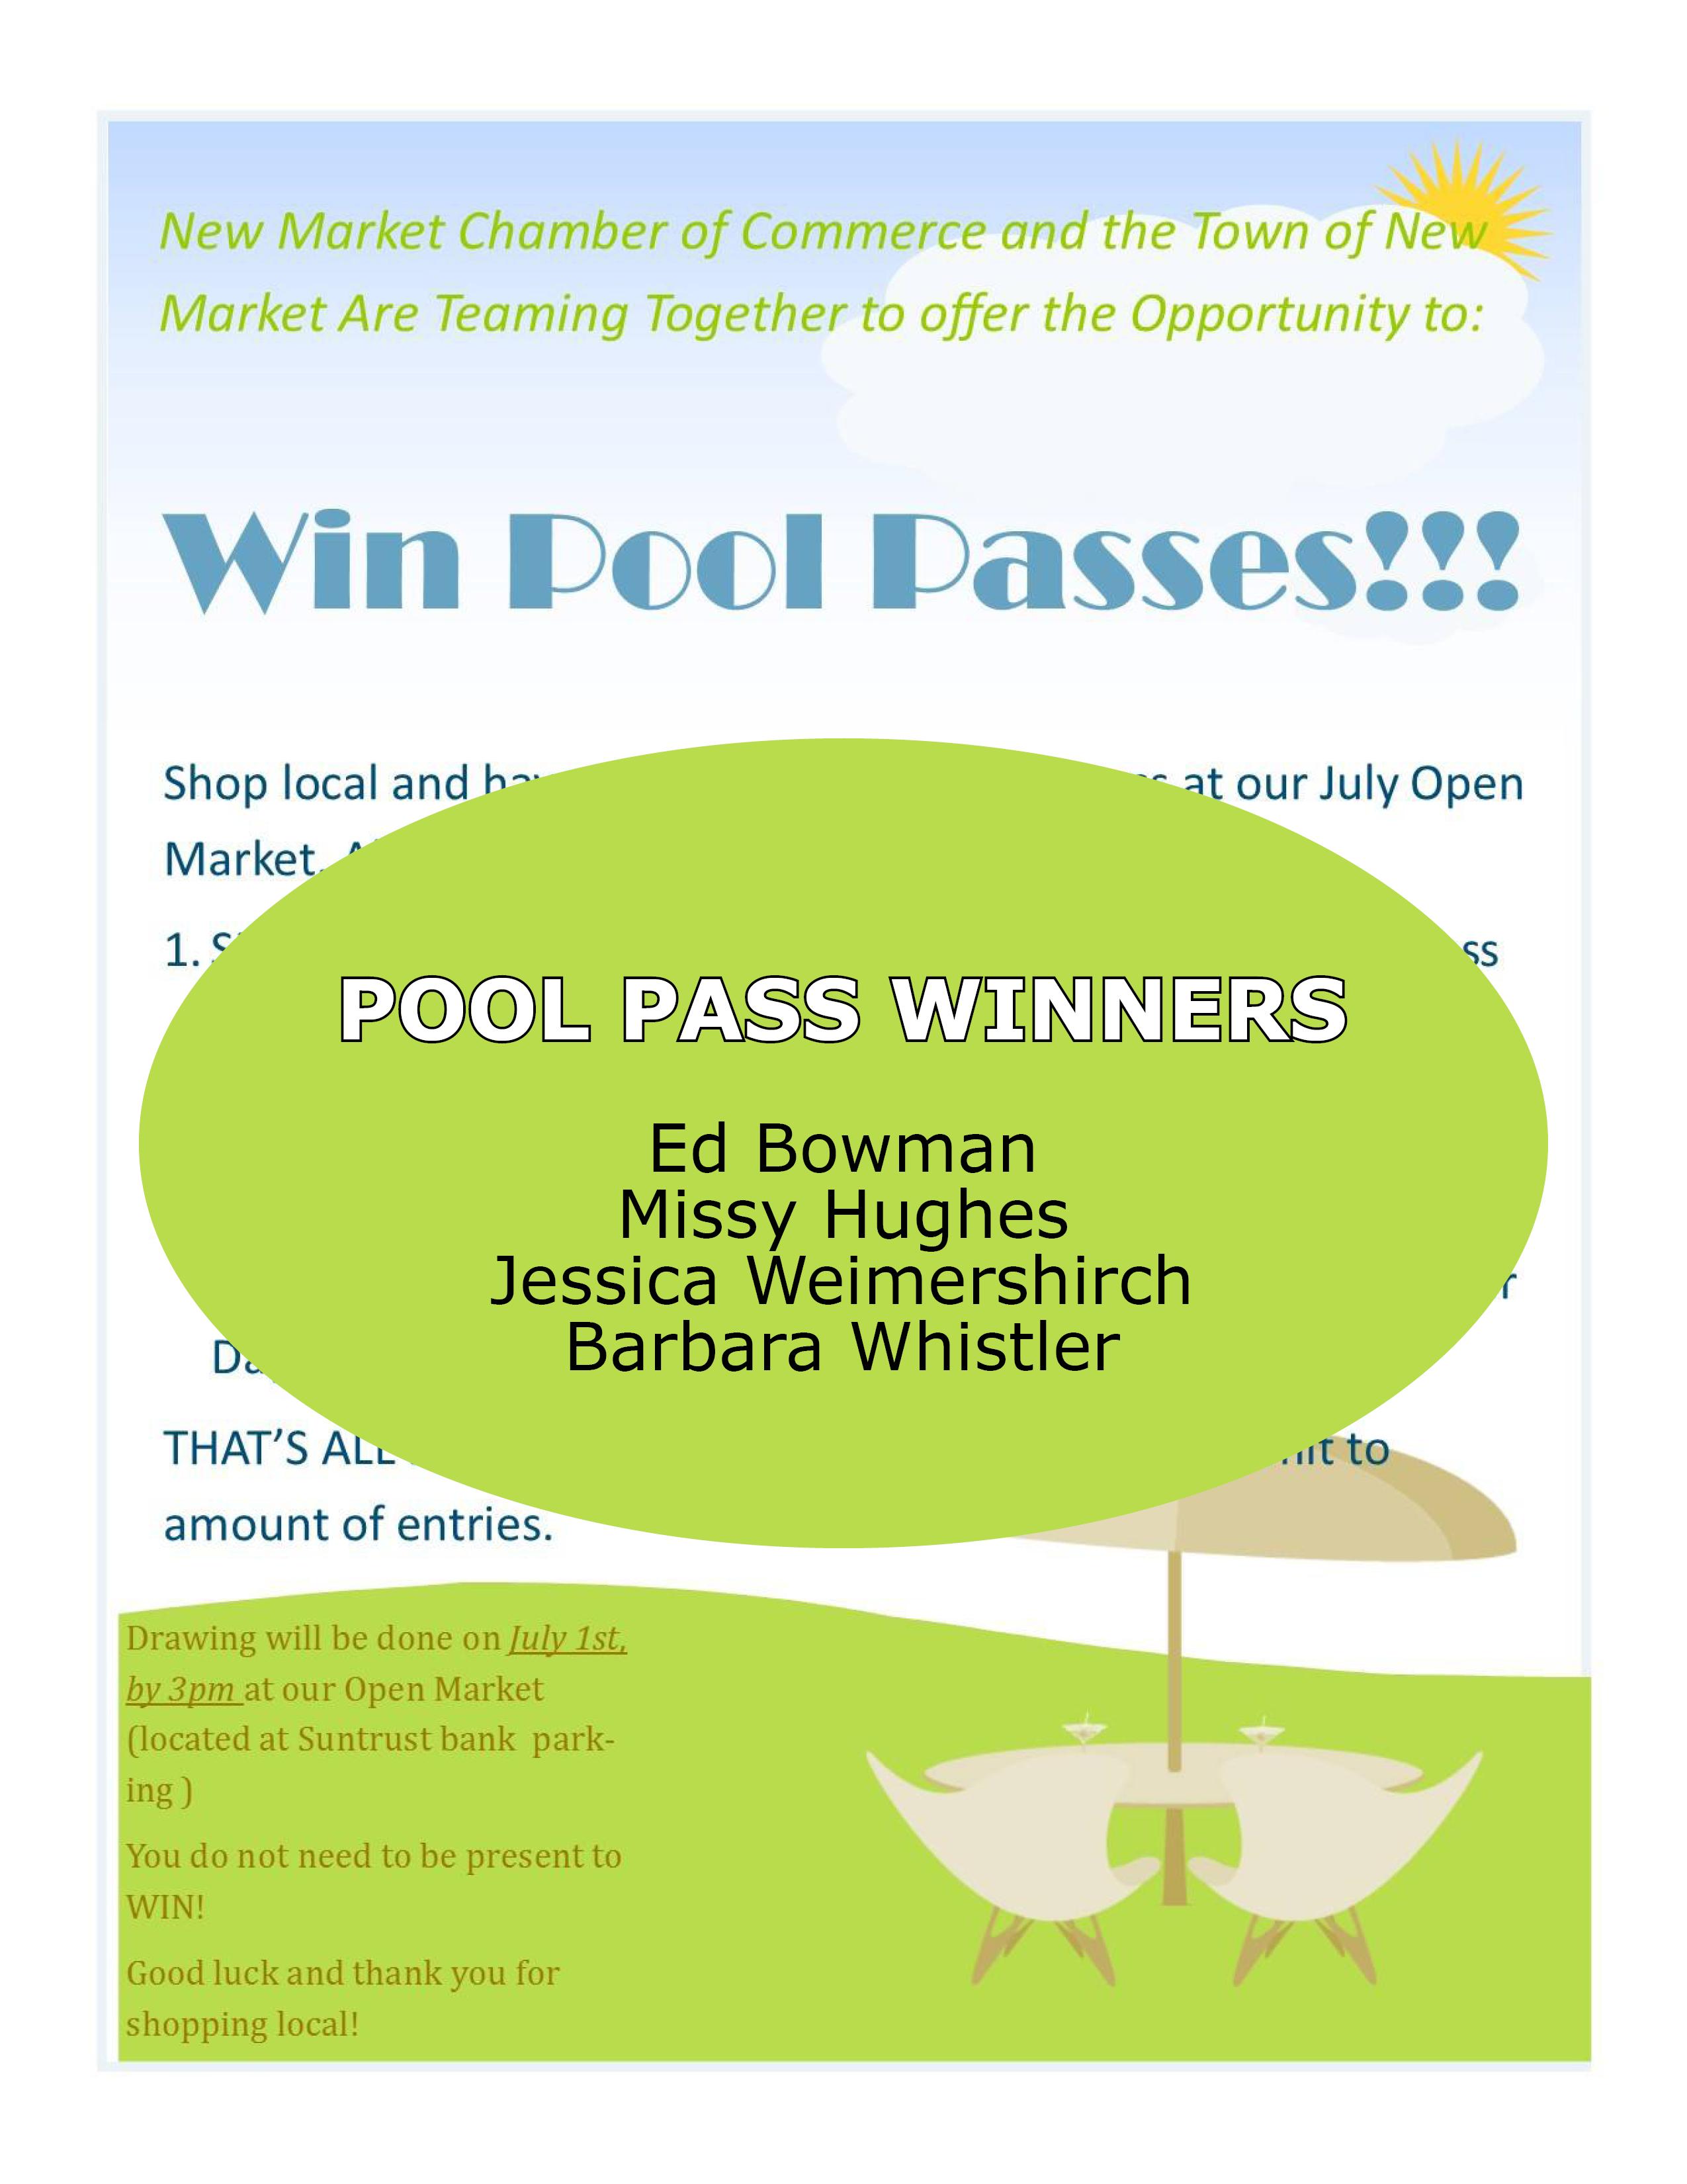 poolpasswinners2017